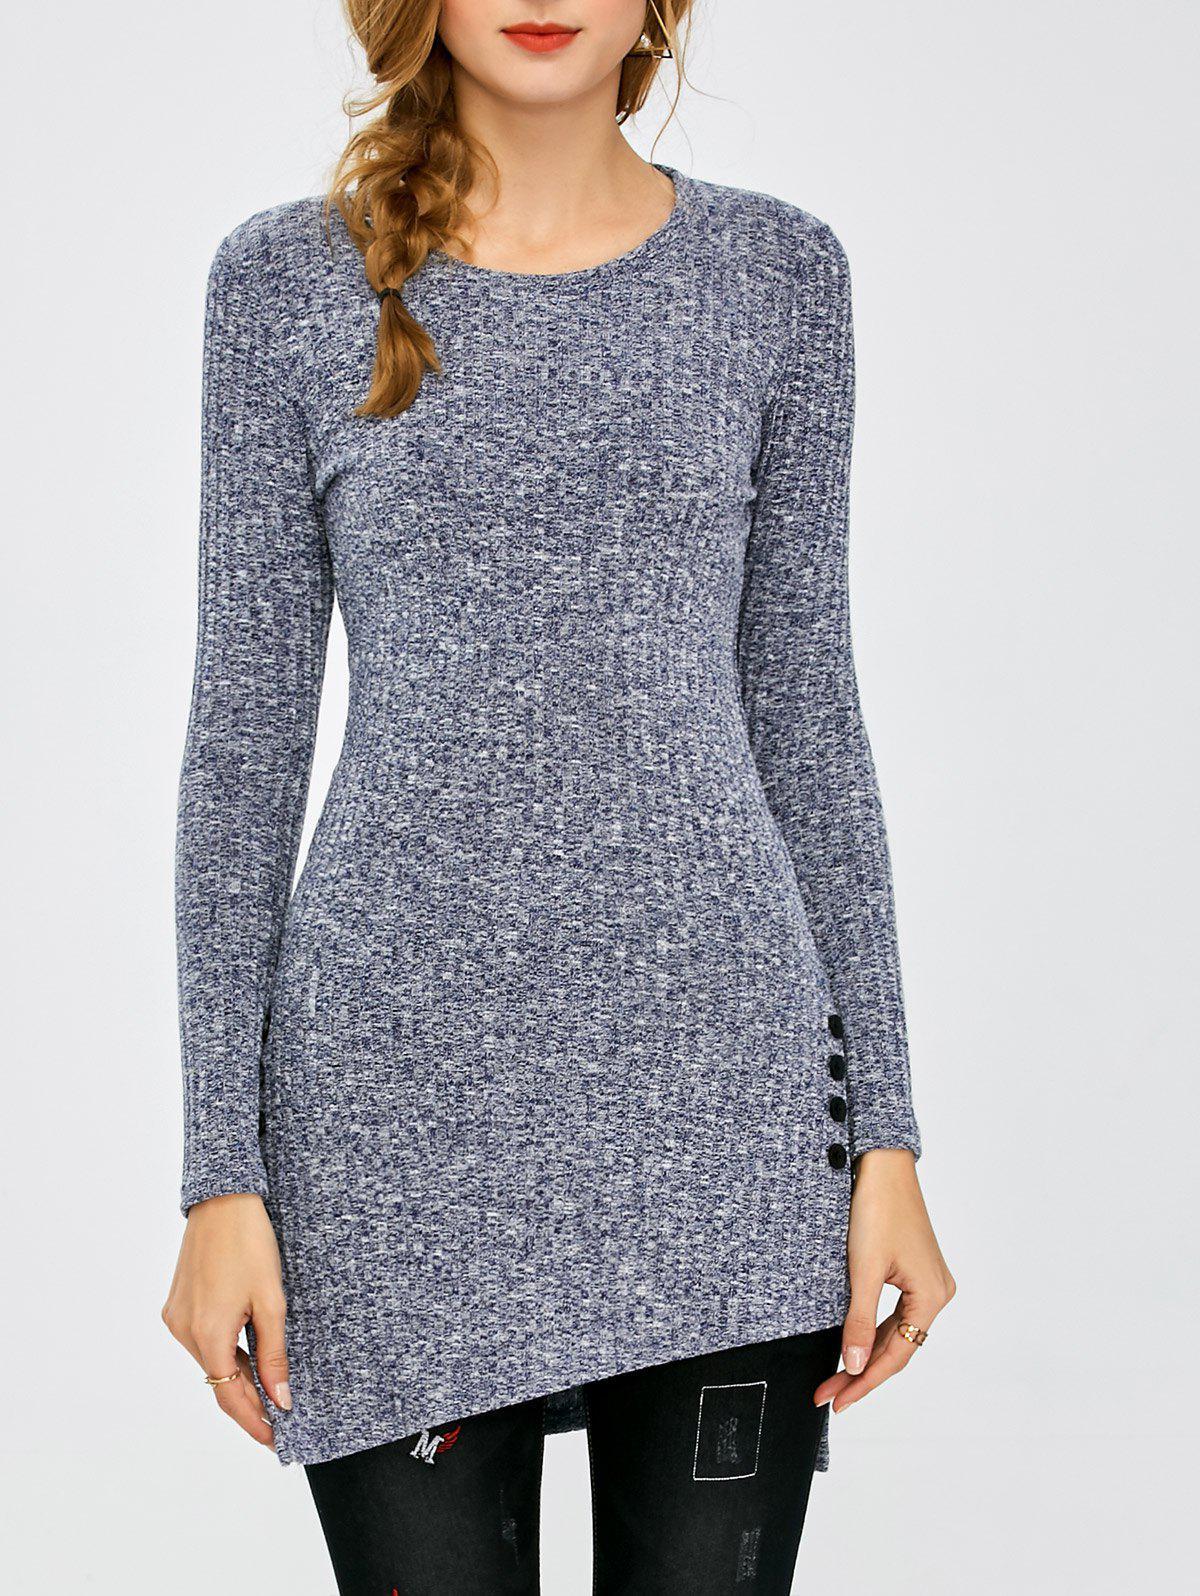 Ribbed Asymmetrical Side Slit Buttoned Knitwear 206015908